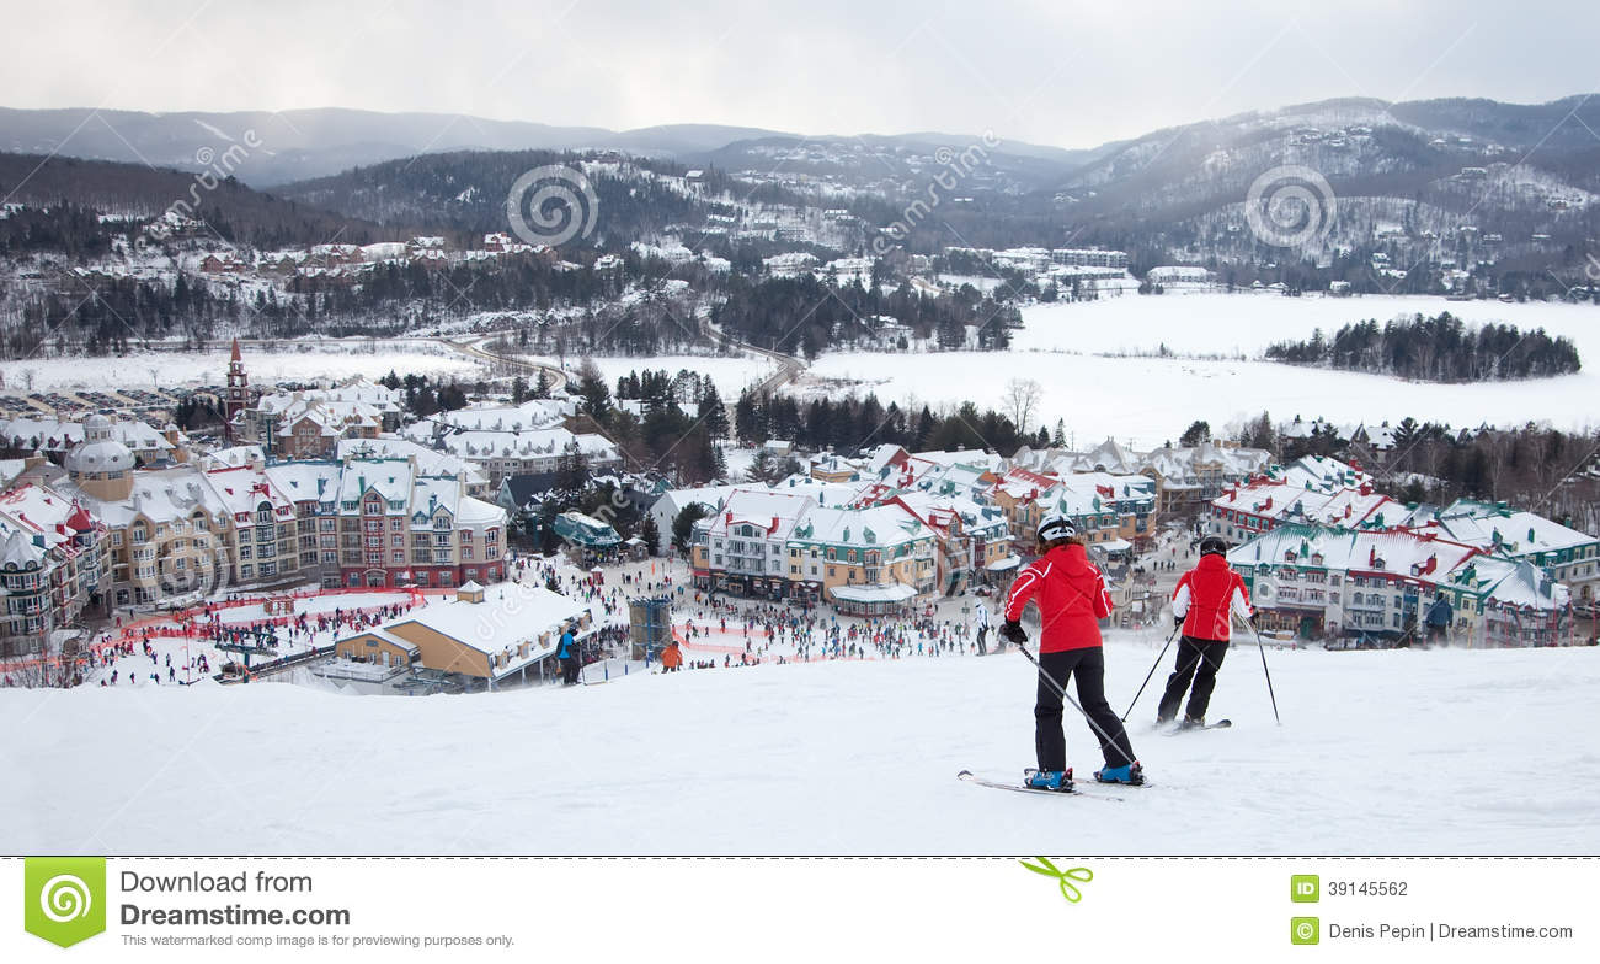 mont-tremblant ski resort, quebec, canada editorial photography